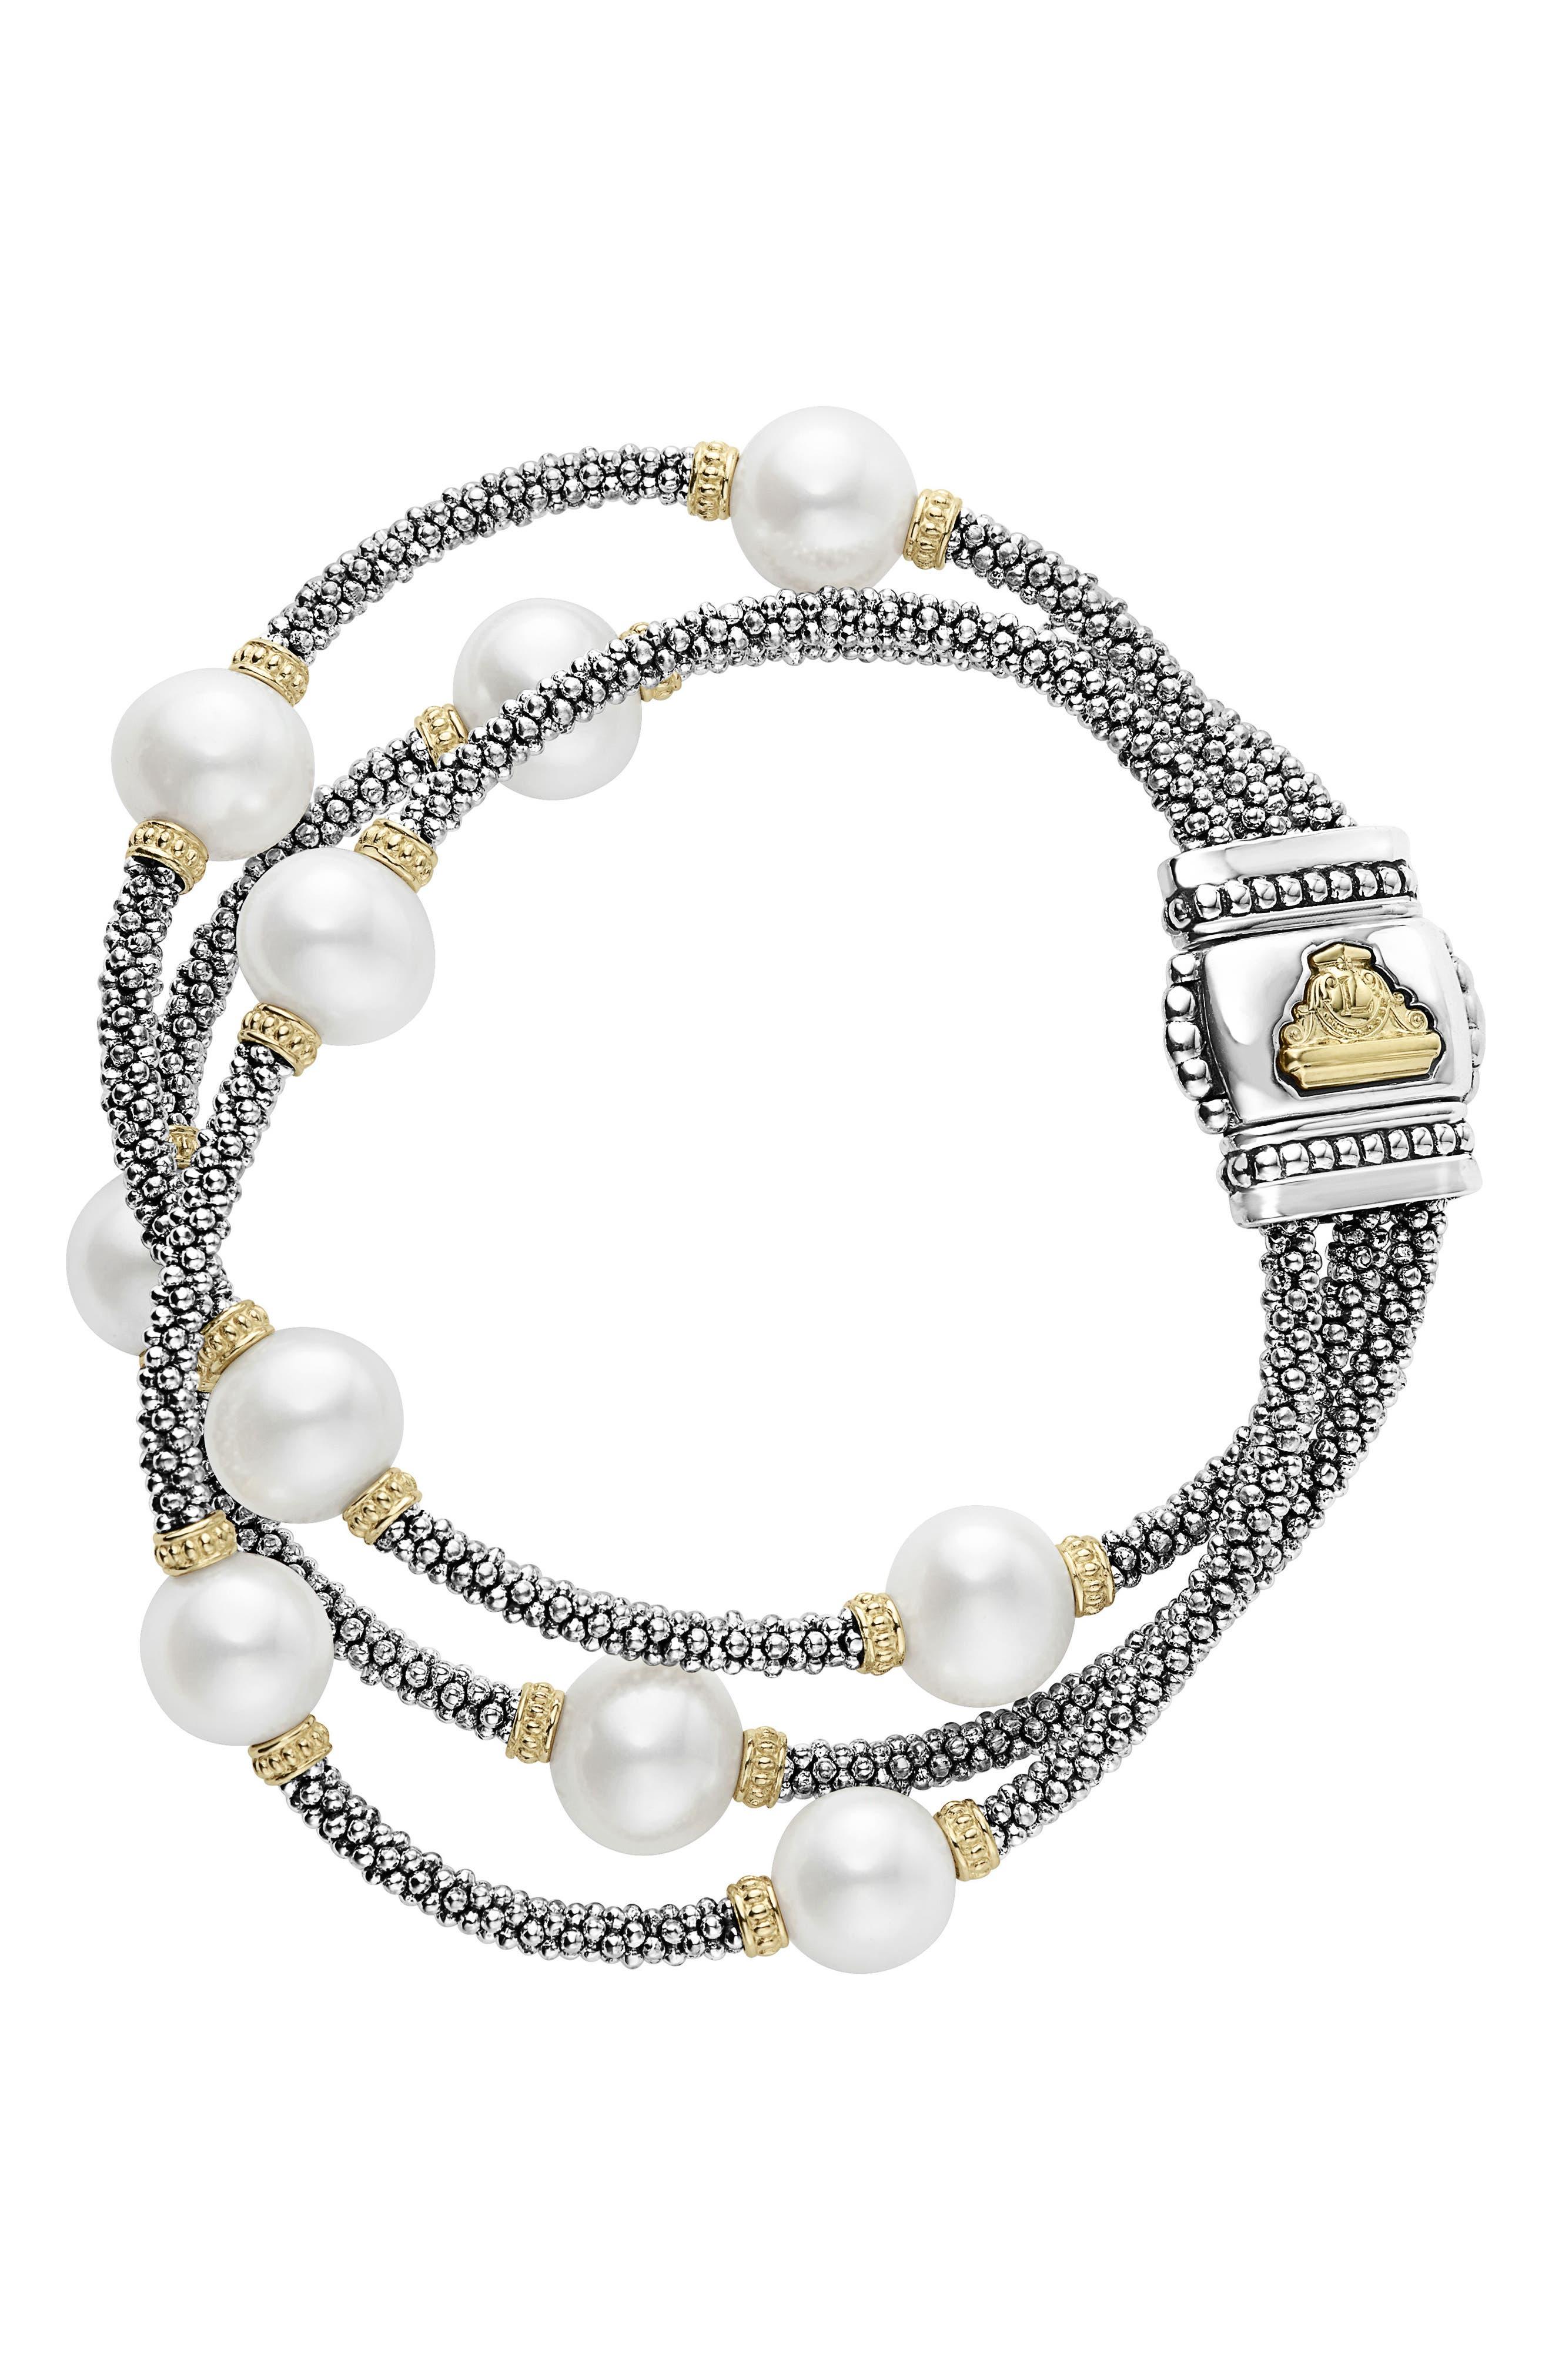 Luna Pearl Caviar Multistrand Bracelet,                             Main thumbnail 1, color,